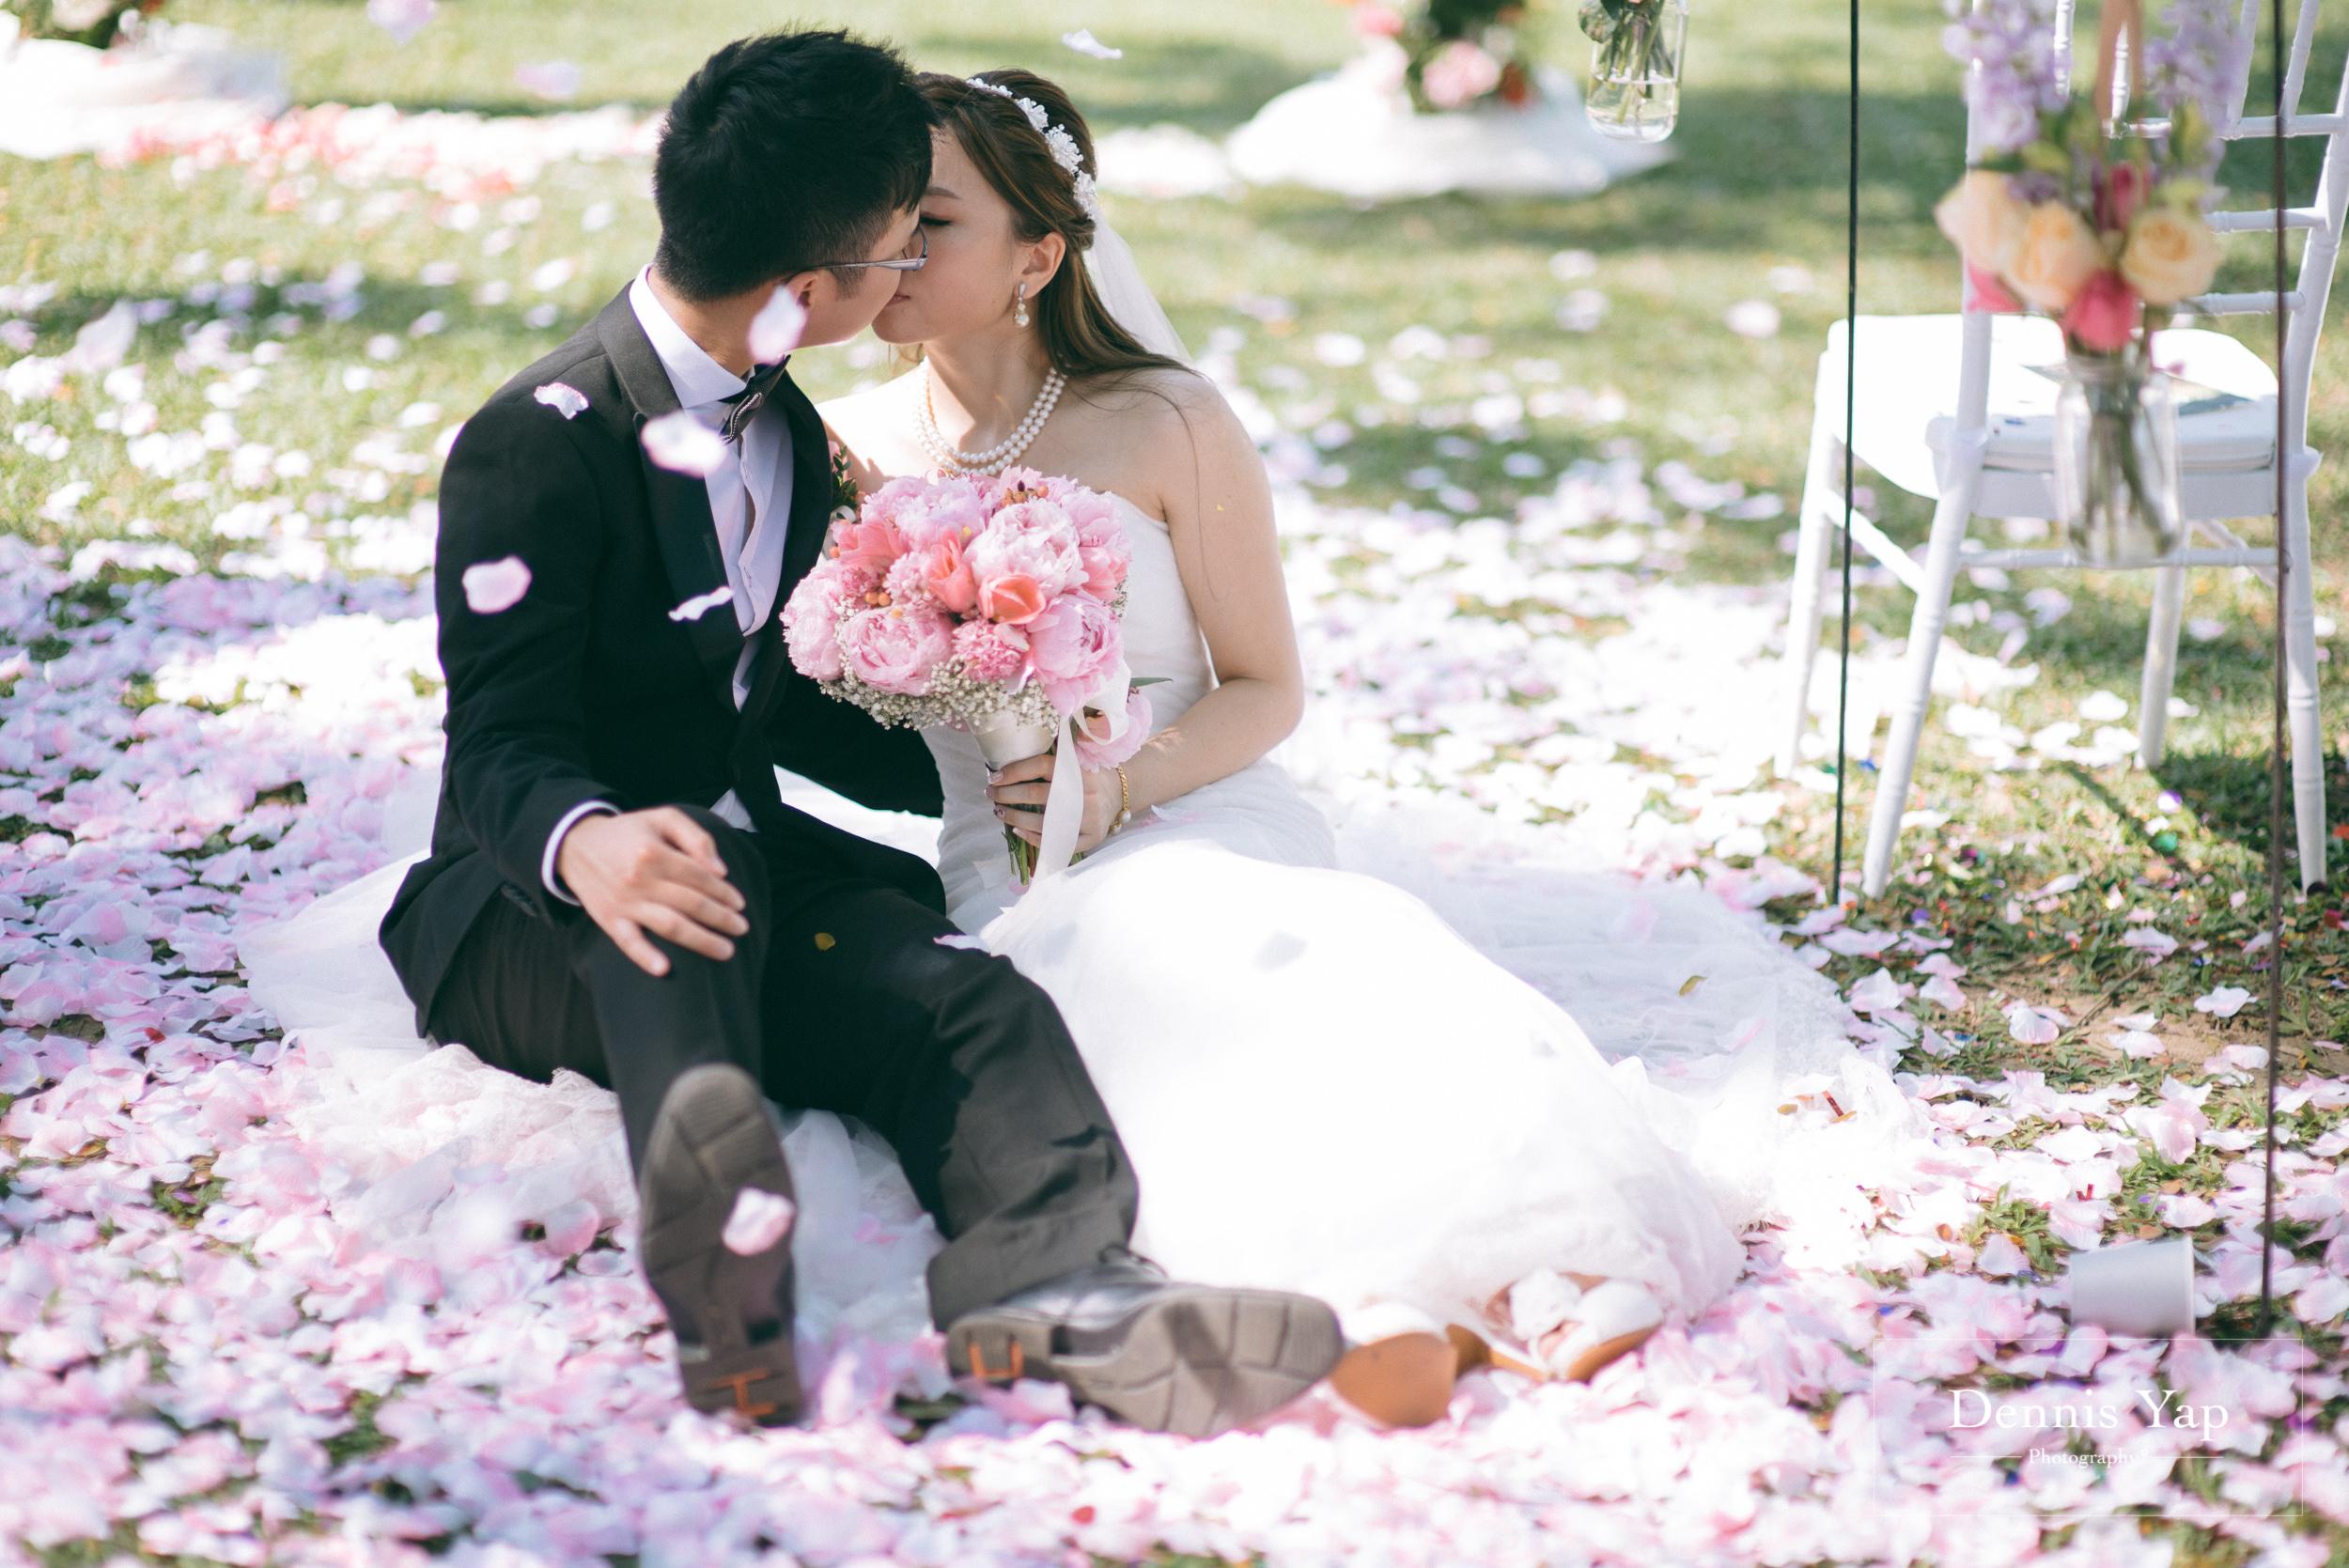 taylai cheng yee garden wedding saujana hotel subang jaya dennis yap photography sunlight-27.jpg